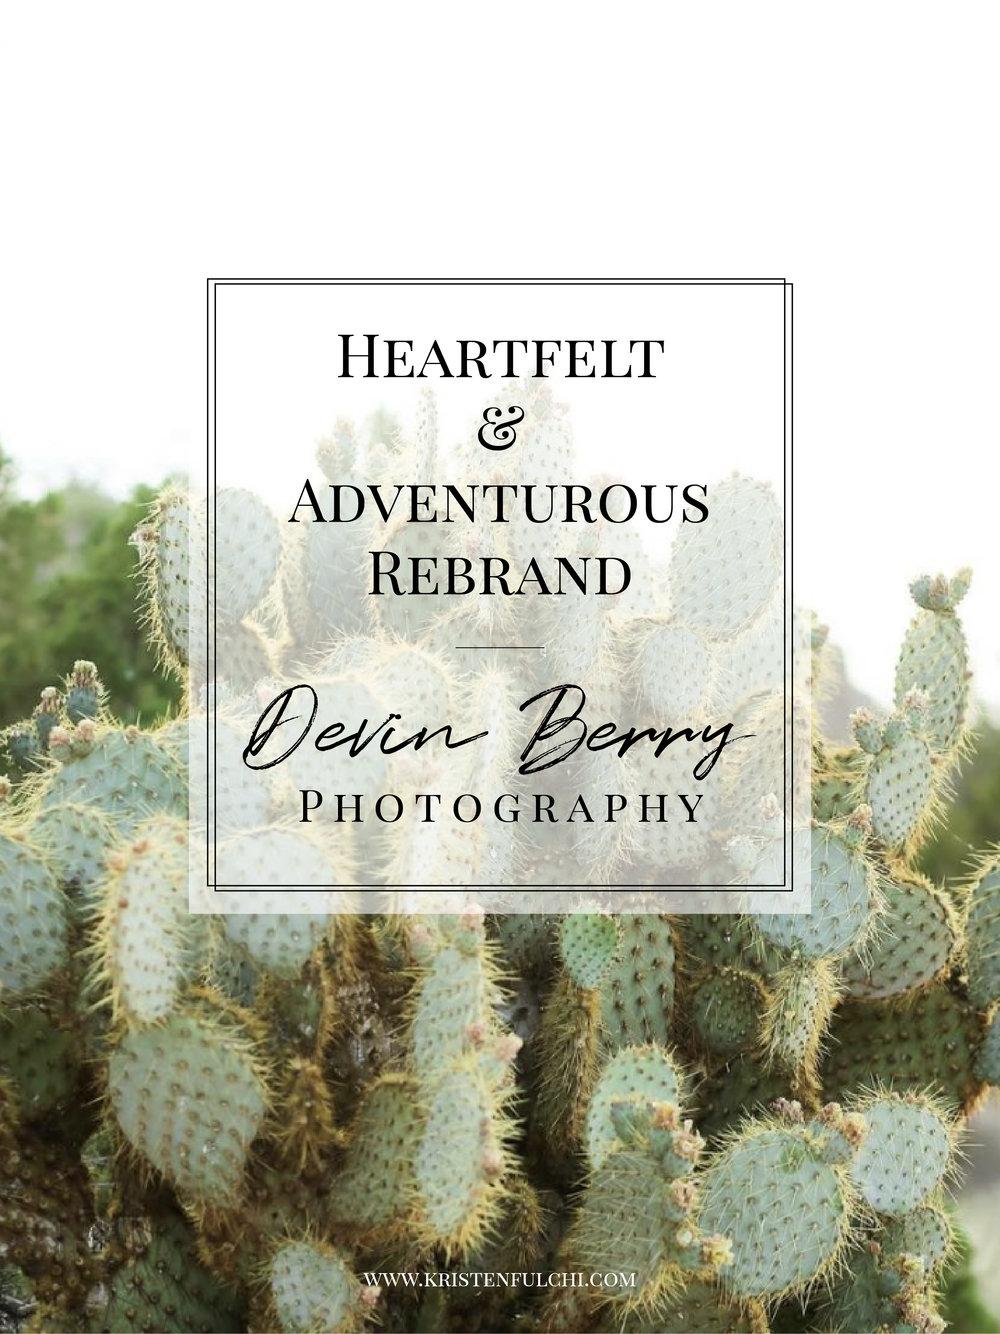 heartfelt-and-adventourous-rebrand-devin-berry-photography-miami-florida-brand-designer-01.jpg